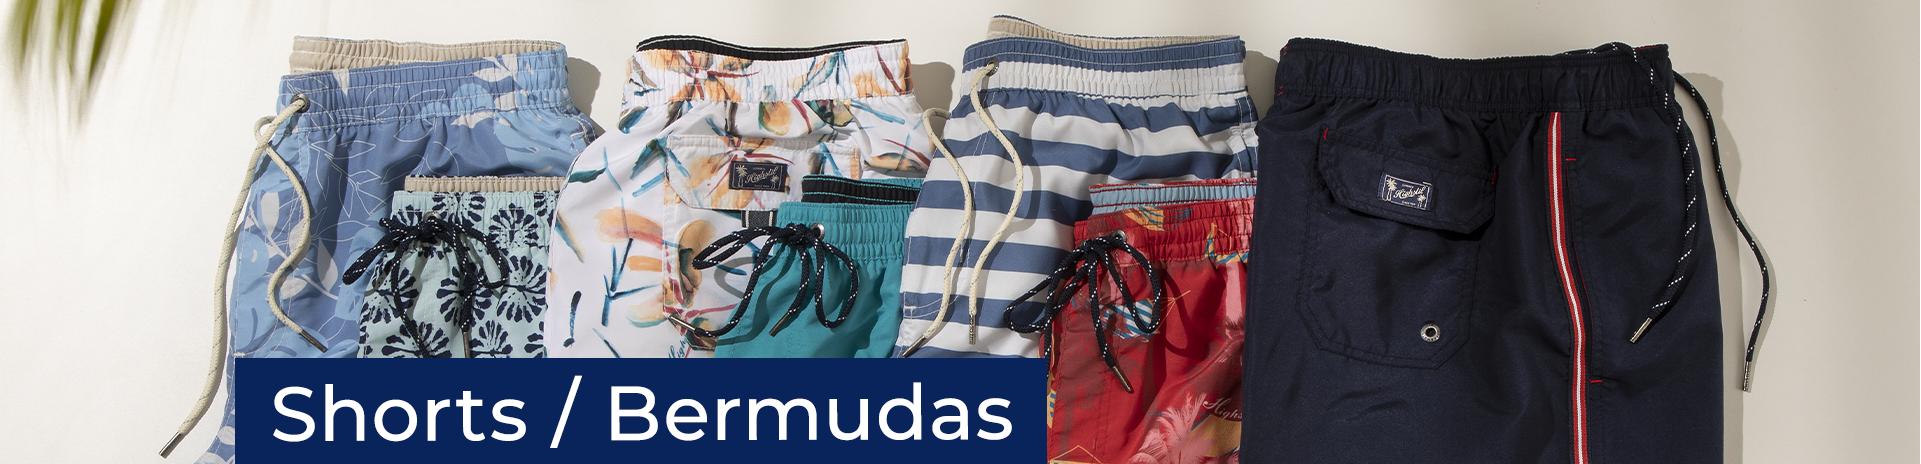 Banner Shorts / Bermudas